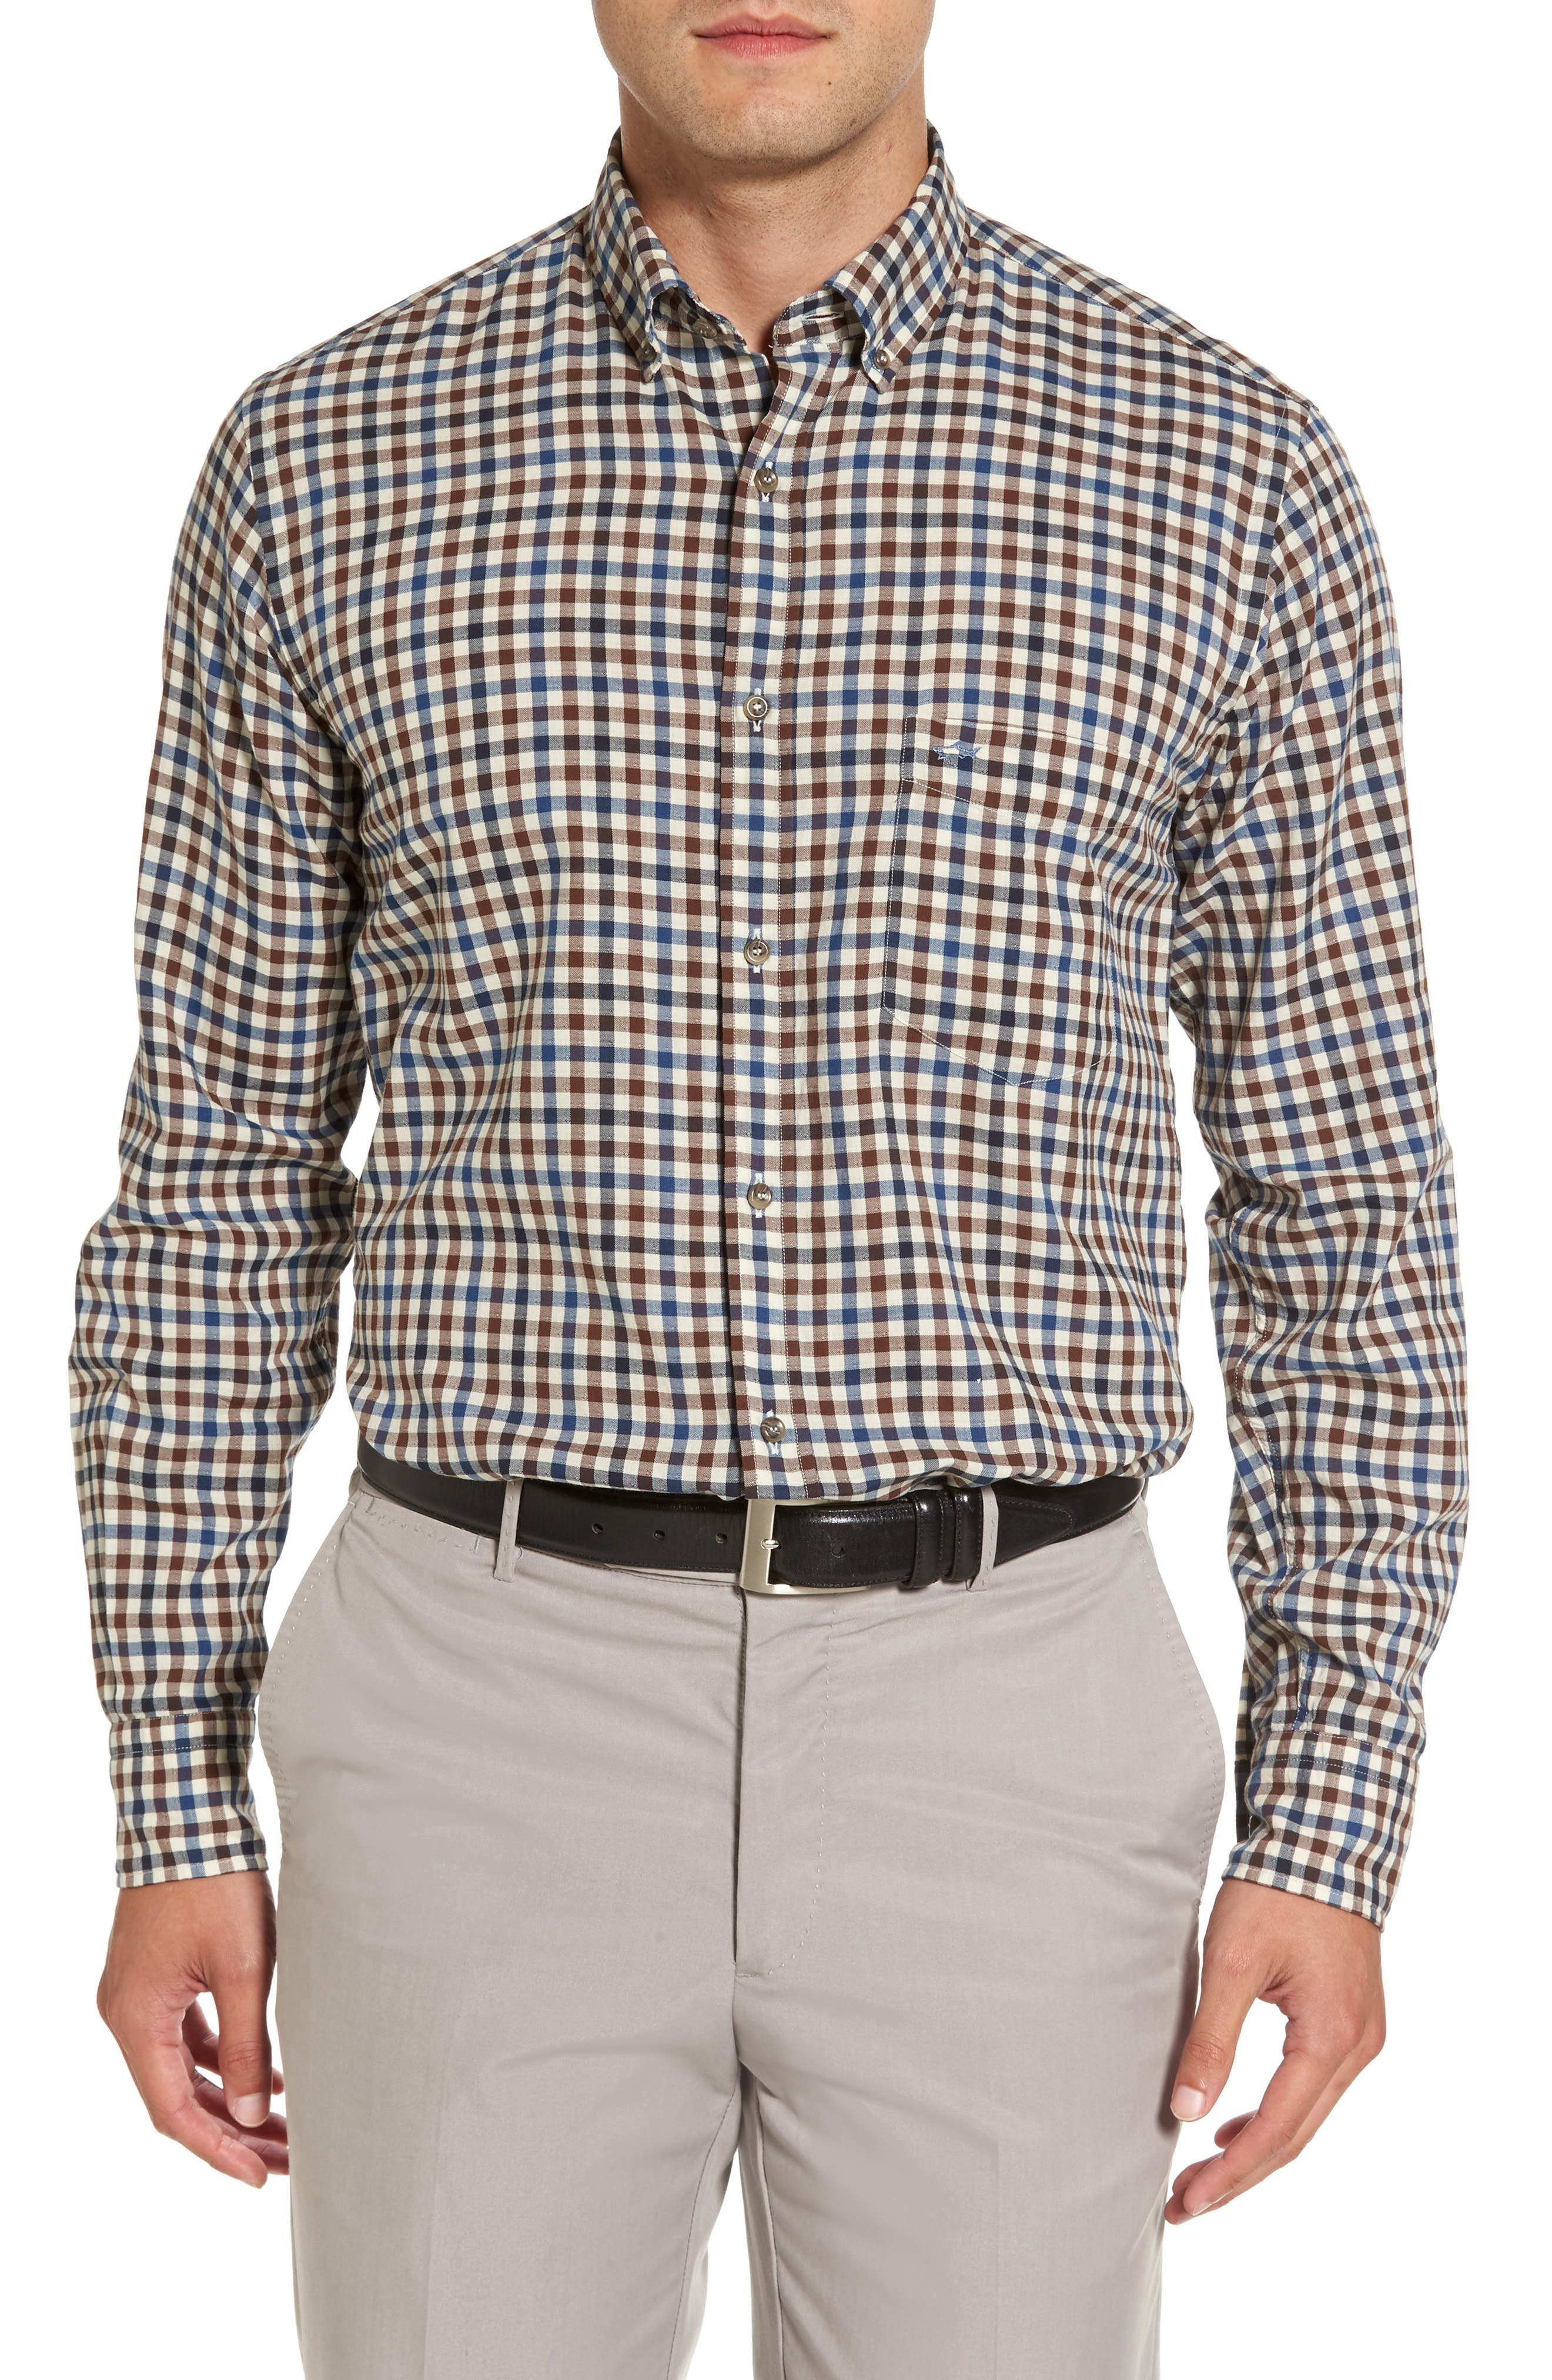 Paul&Shark Jacquard Check Sport Shirt,                         Main,                         color, 200